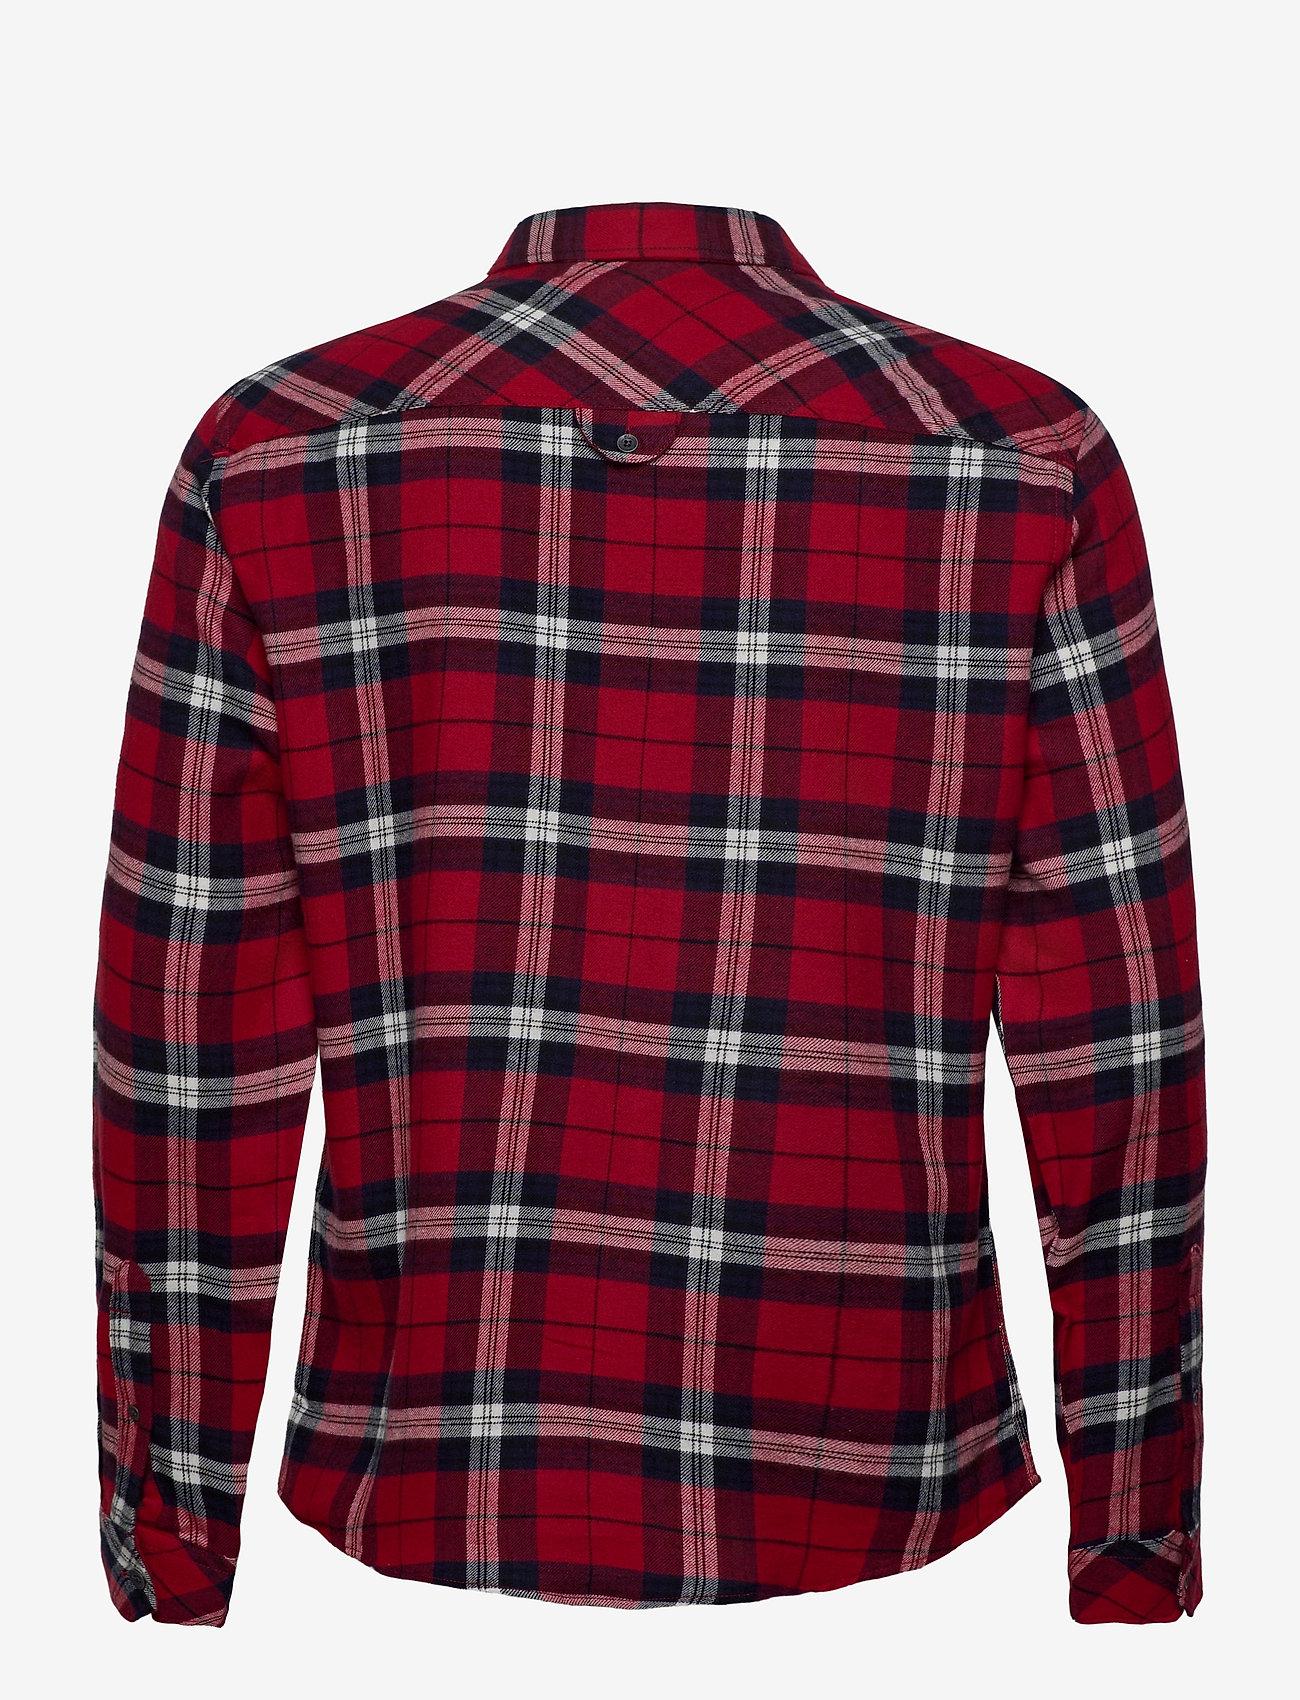 Blend - Shirt - koszule w kratkę - chili pepper - 1